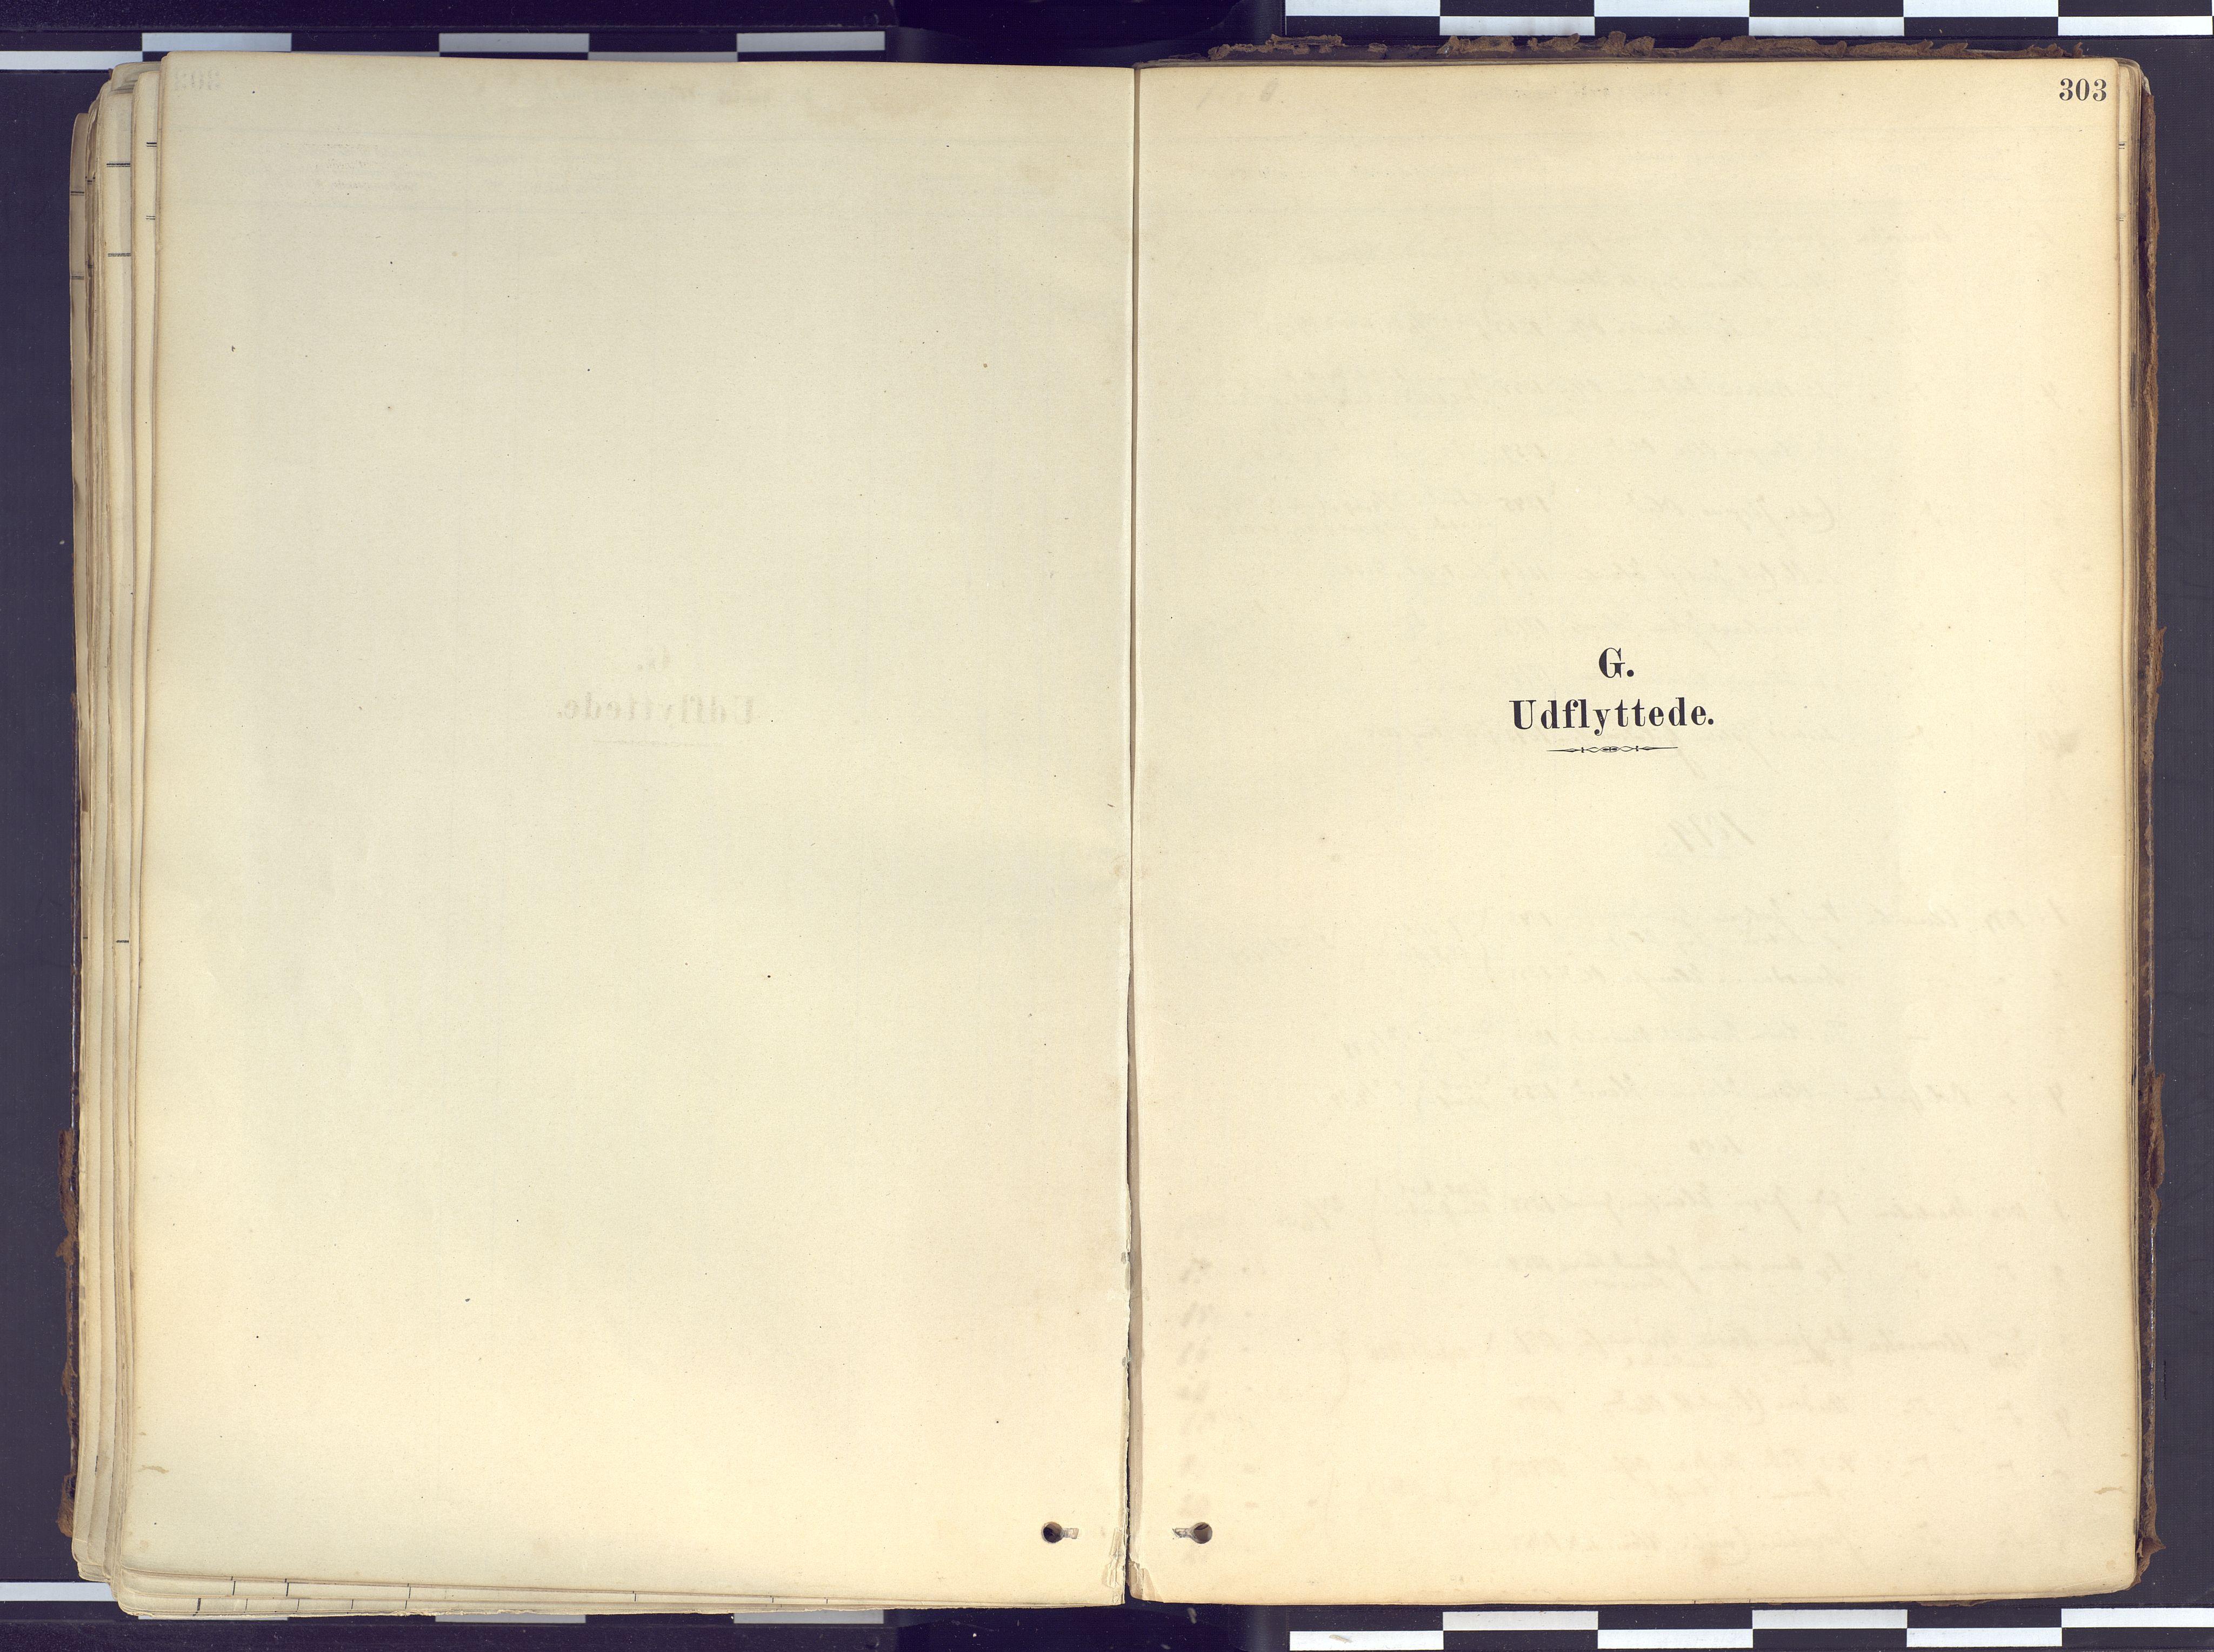 SATØ, Tranøy sokneprestkontor, I/Ia/Iaa/L0010kirke: Ministerialbok nr. 10, 1878-1904, s. 303